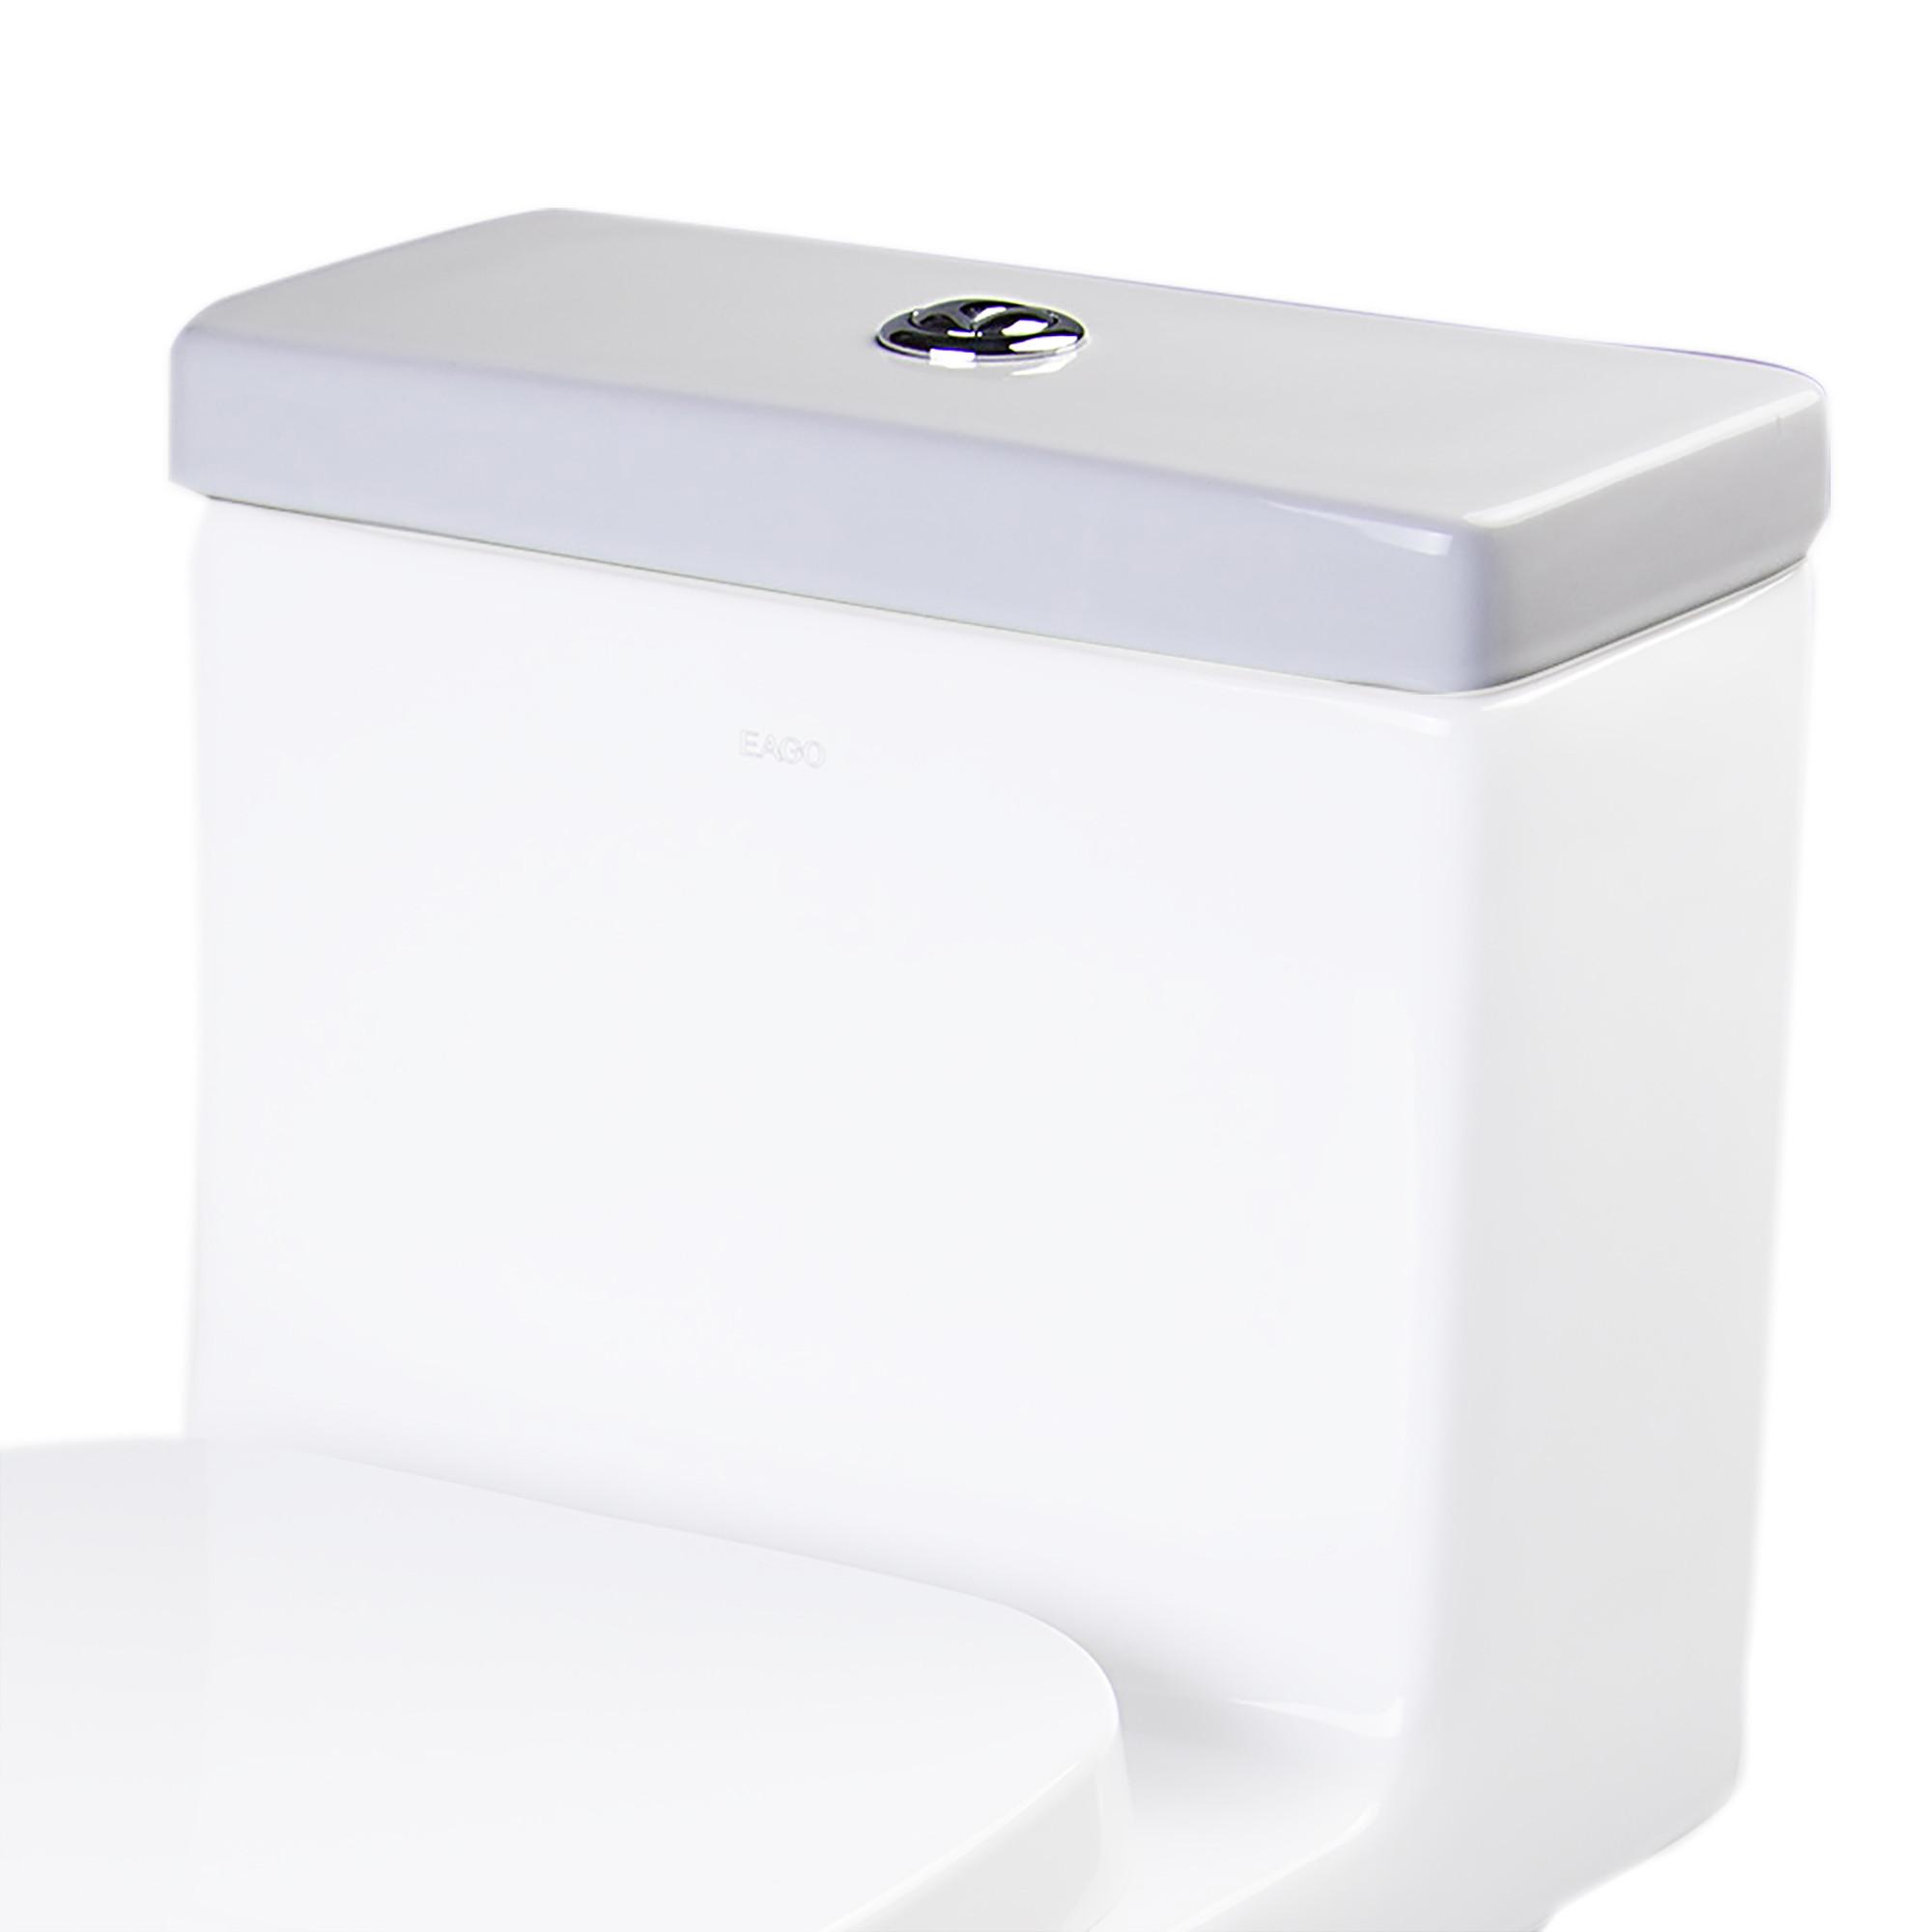 EAGO R-339LID Replacement Ceramic Toilet Lid for TB359